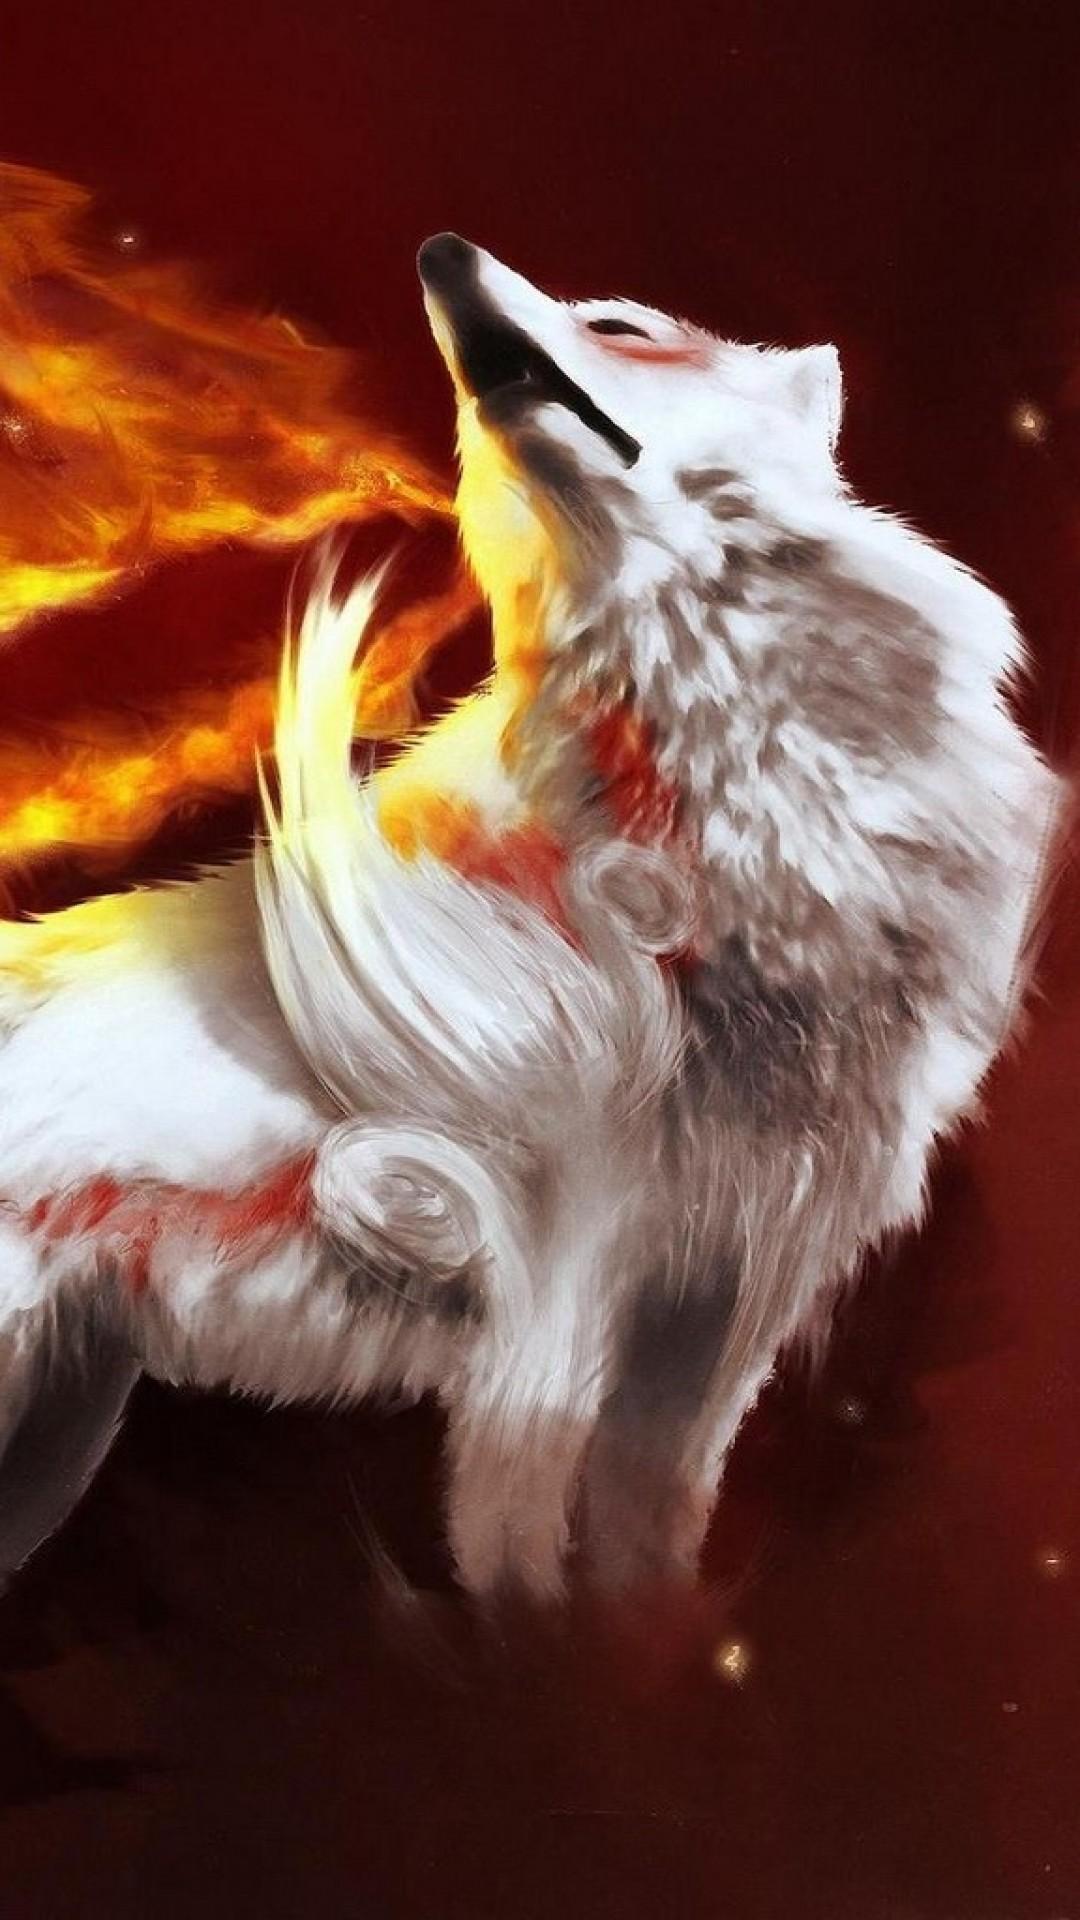 Wallpaper abstraction, fire, wolf, gray, light